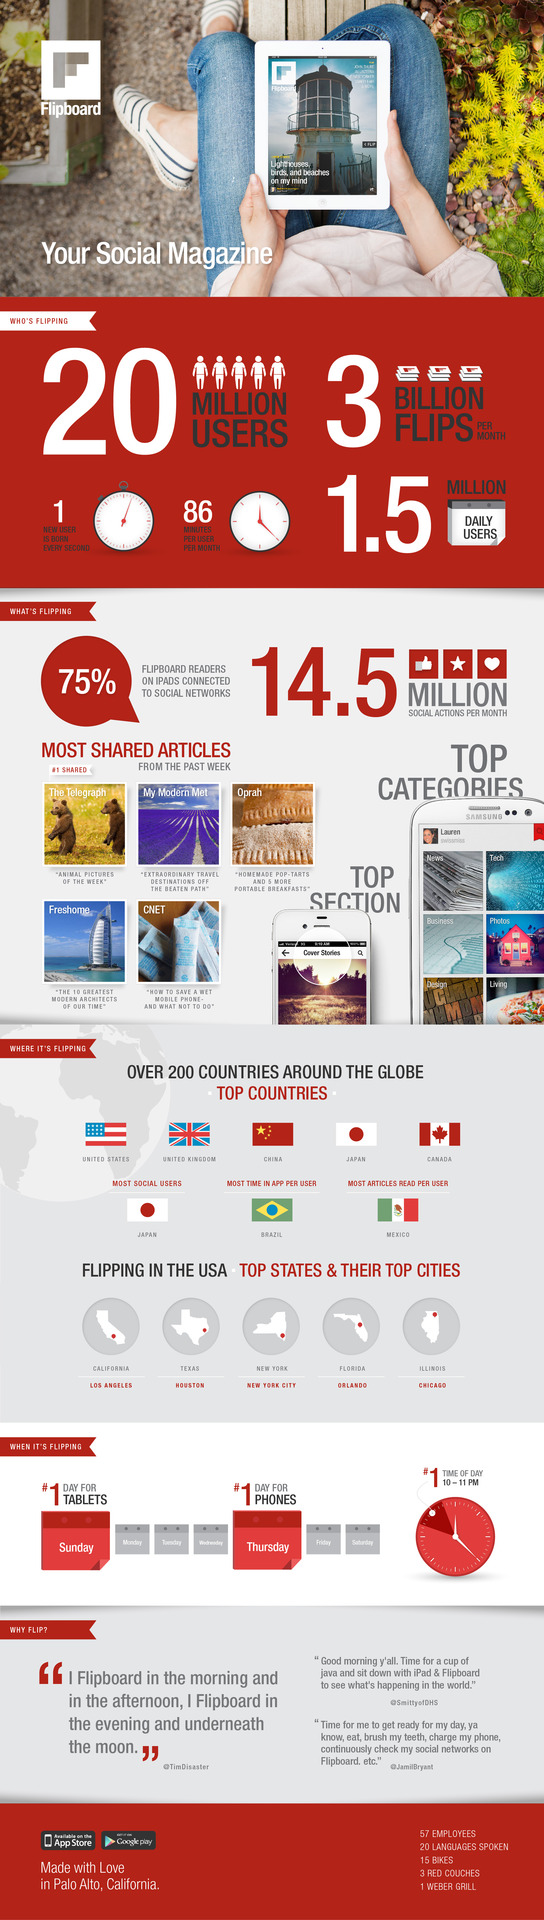 Flipboard: 20 Million Users [INFOGRAPHIC]